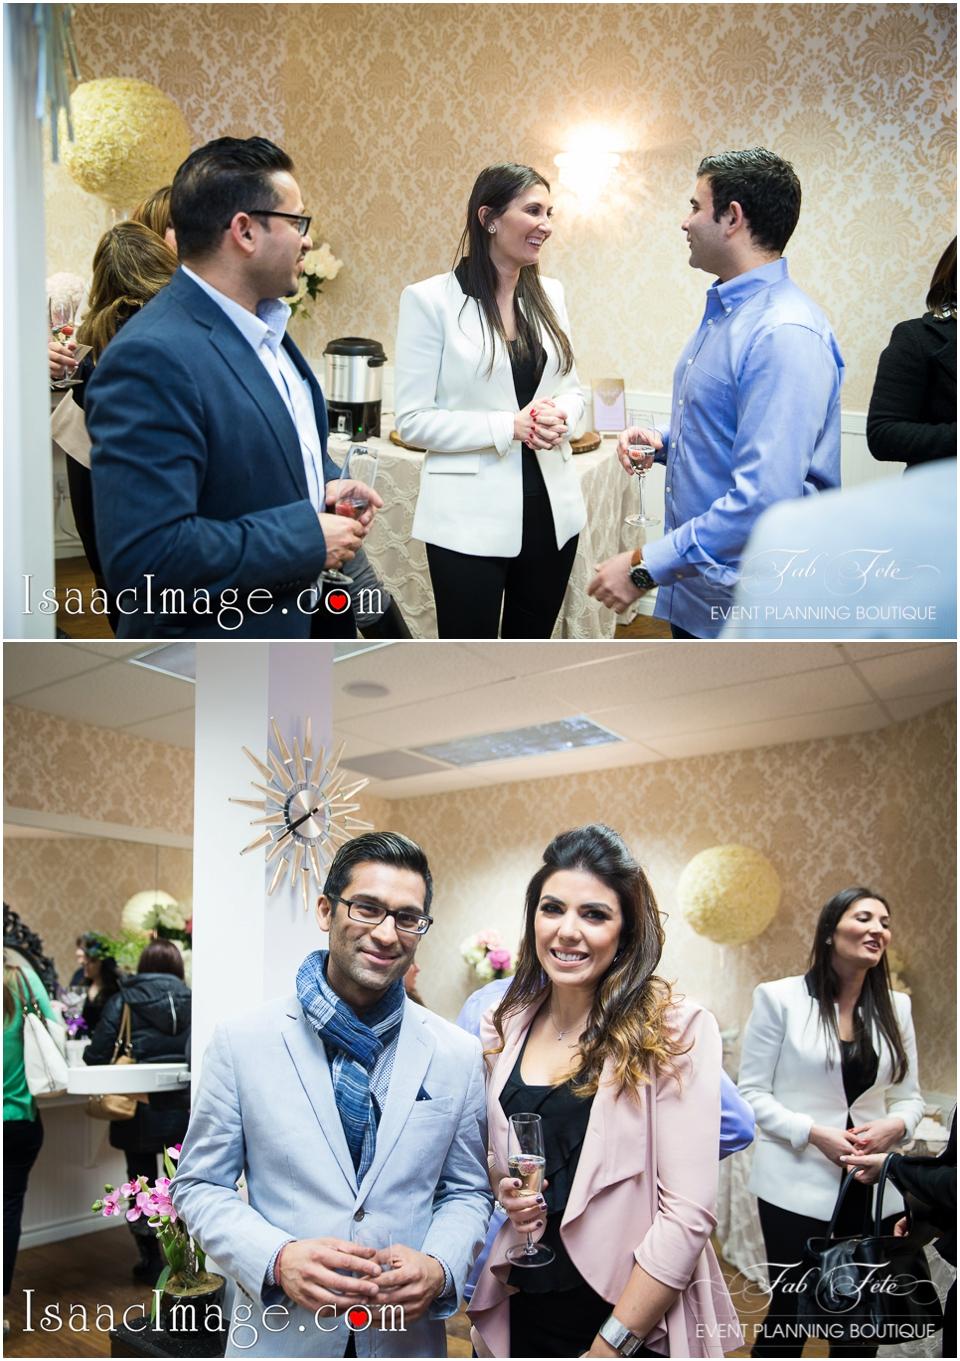 Fab Fete Toronto Wedding Event Planning Boutique open house_6468.jpg